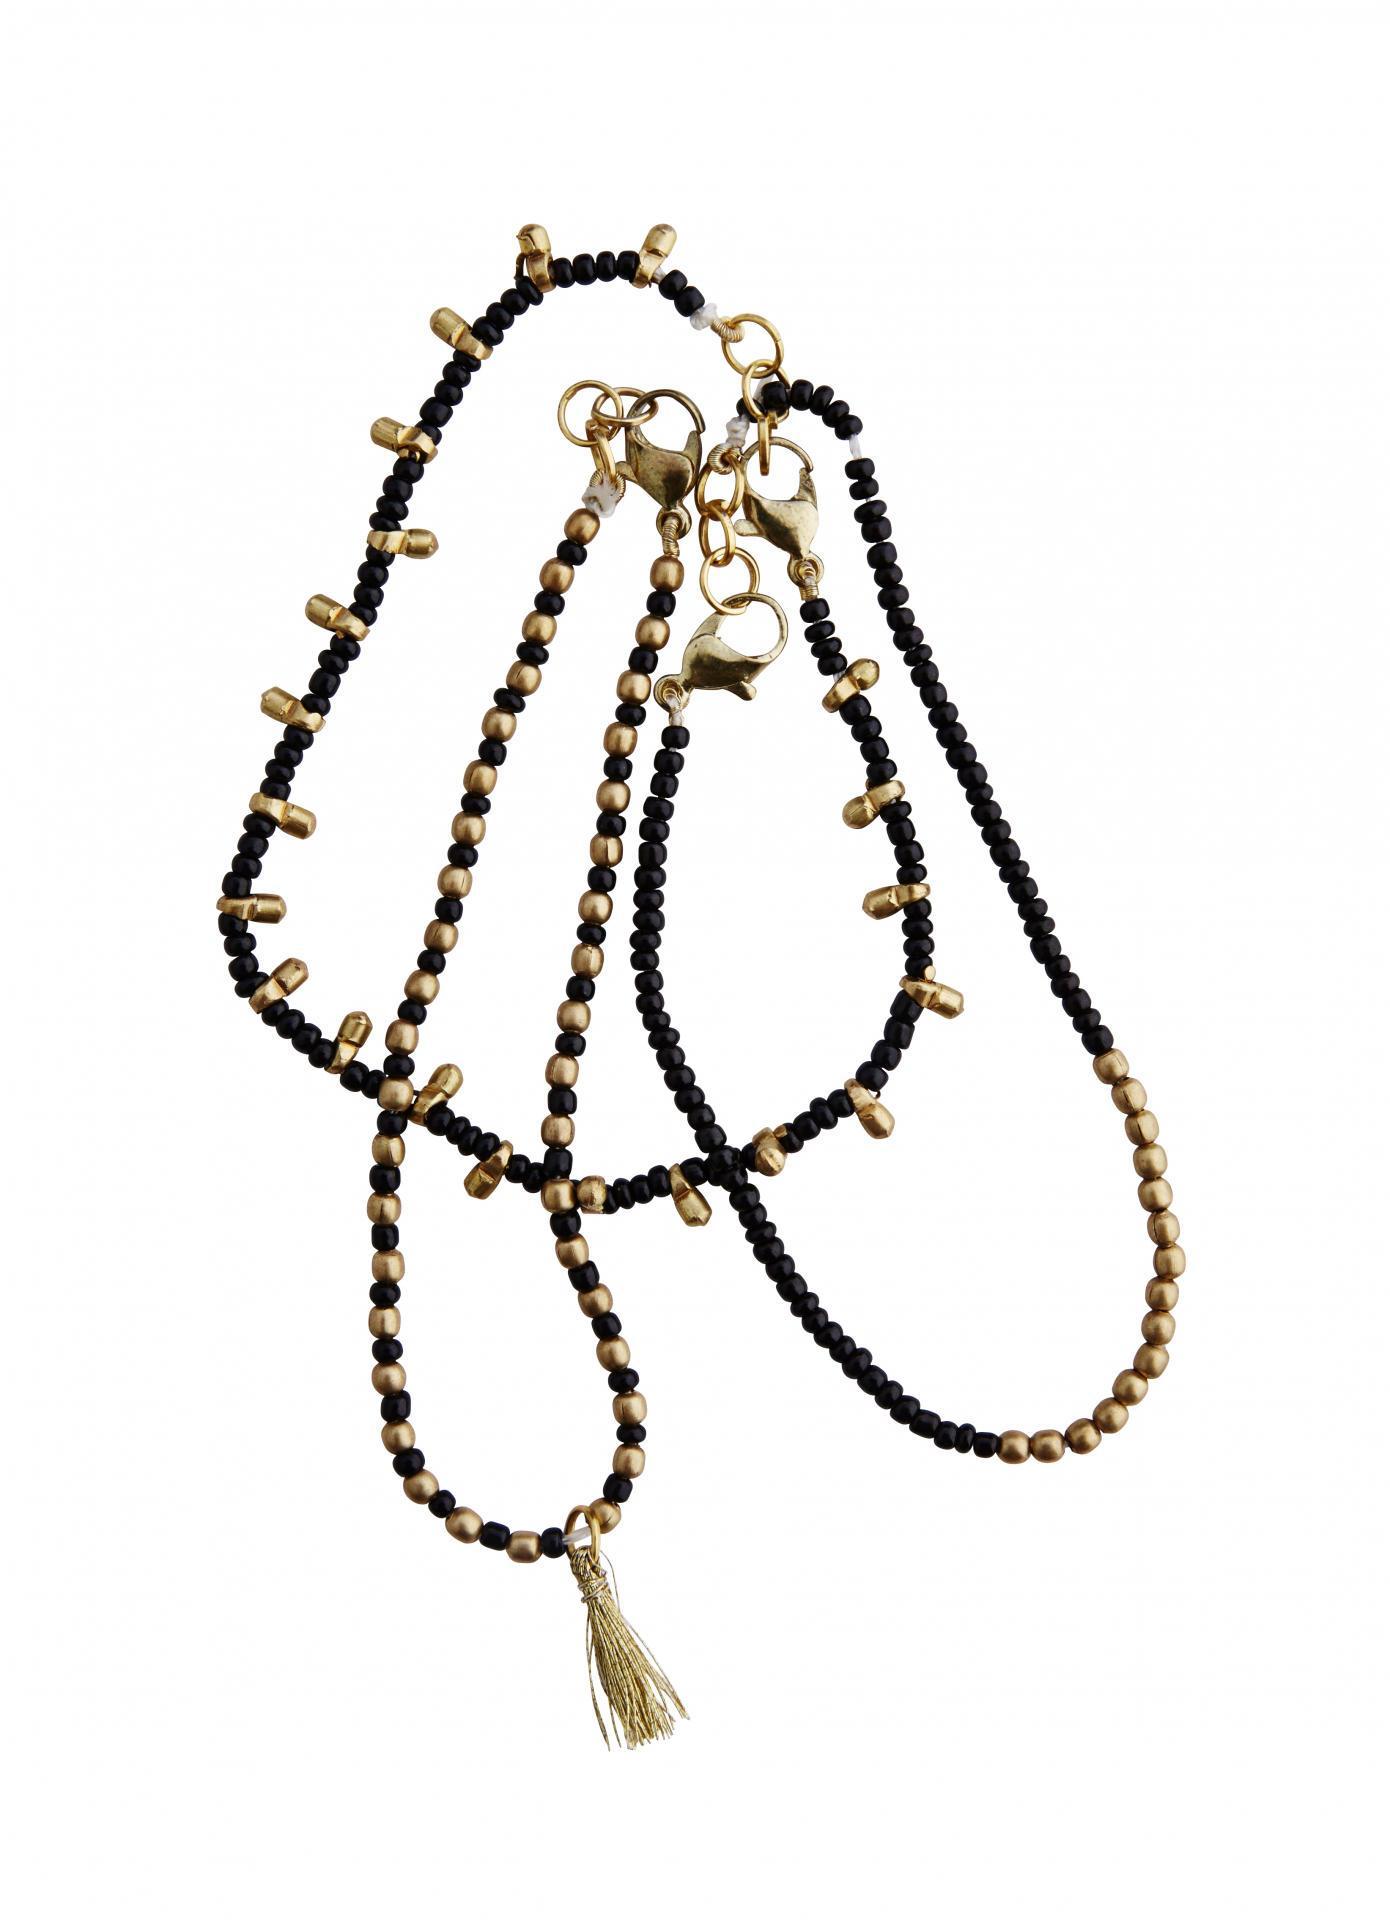 MADAM STOLTZ Set tří náramků Nai Disha Black/Gold, černá barva, zlatá barva, plast